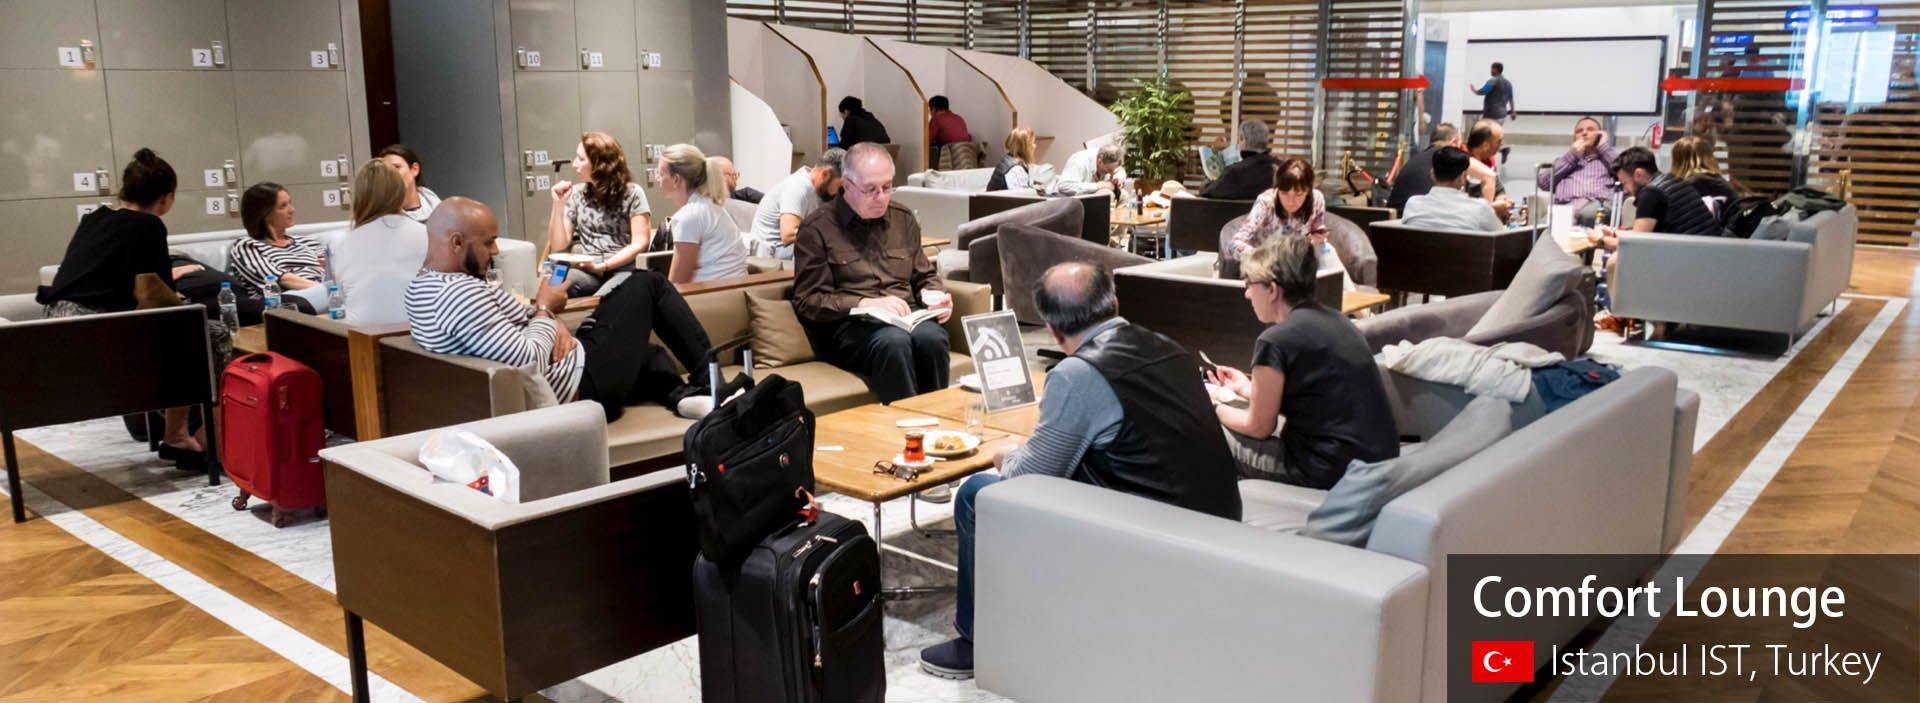 Lounge Review: Comfort Lounge at Istanbul Ataturk